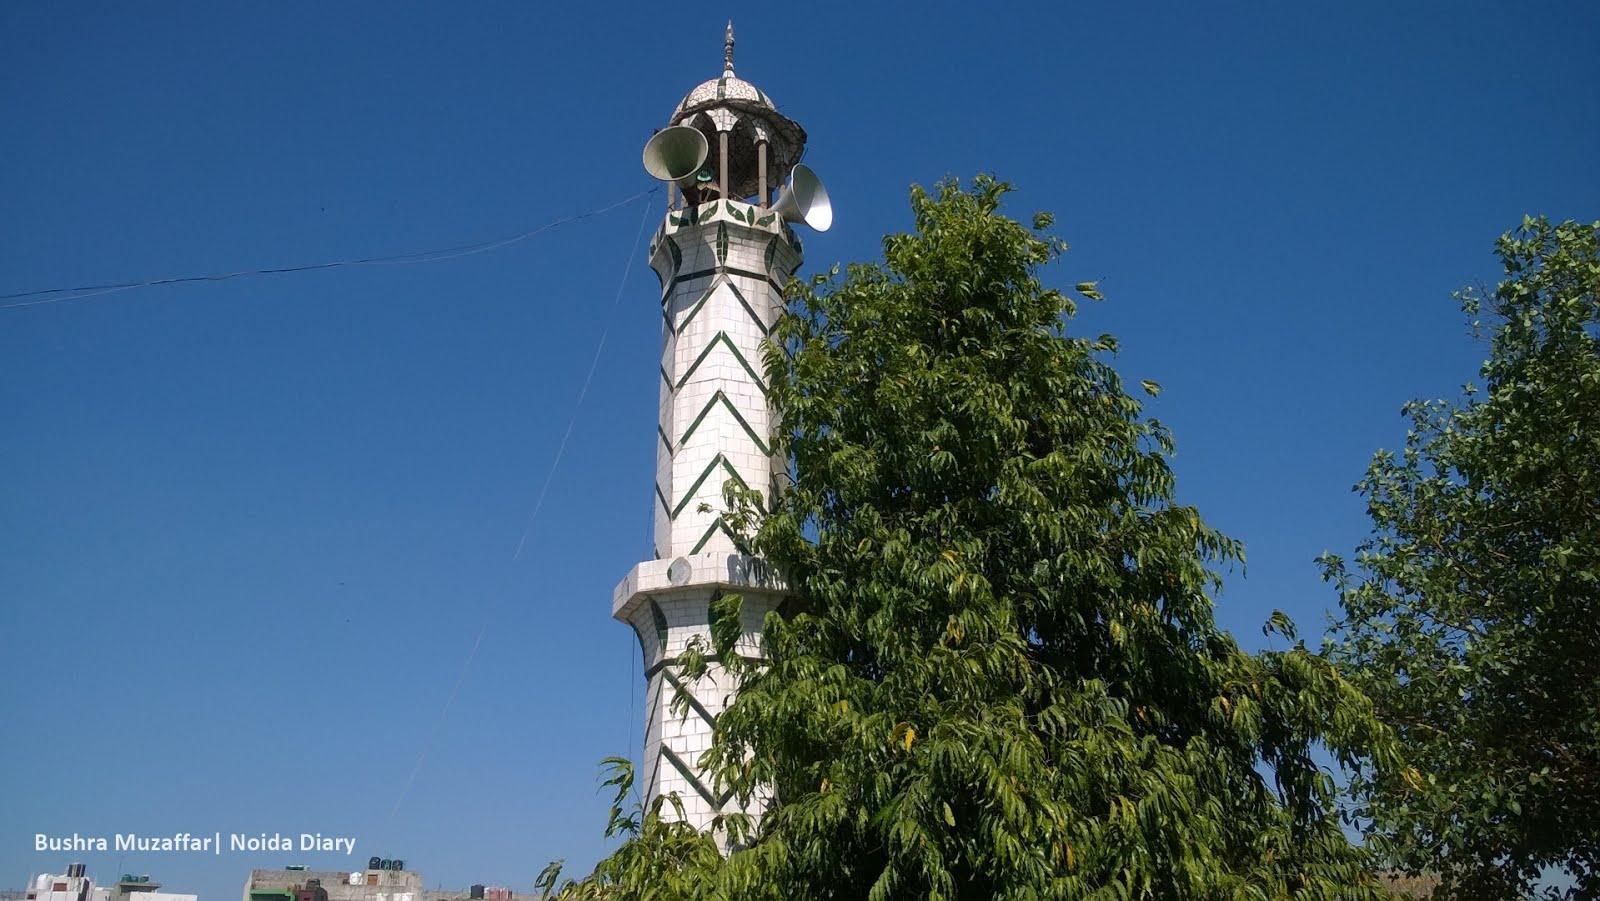 Jumu' atul Wida at Noida Masjid